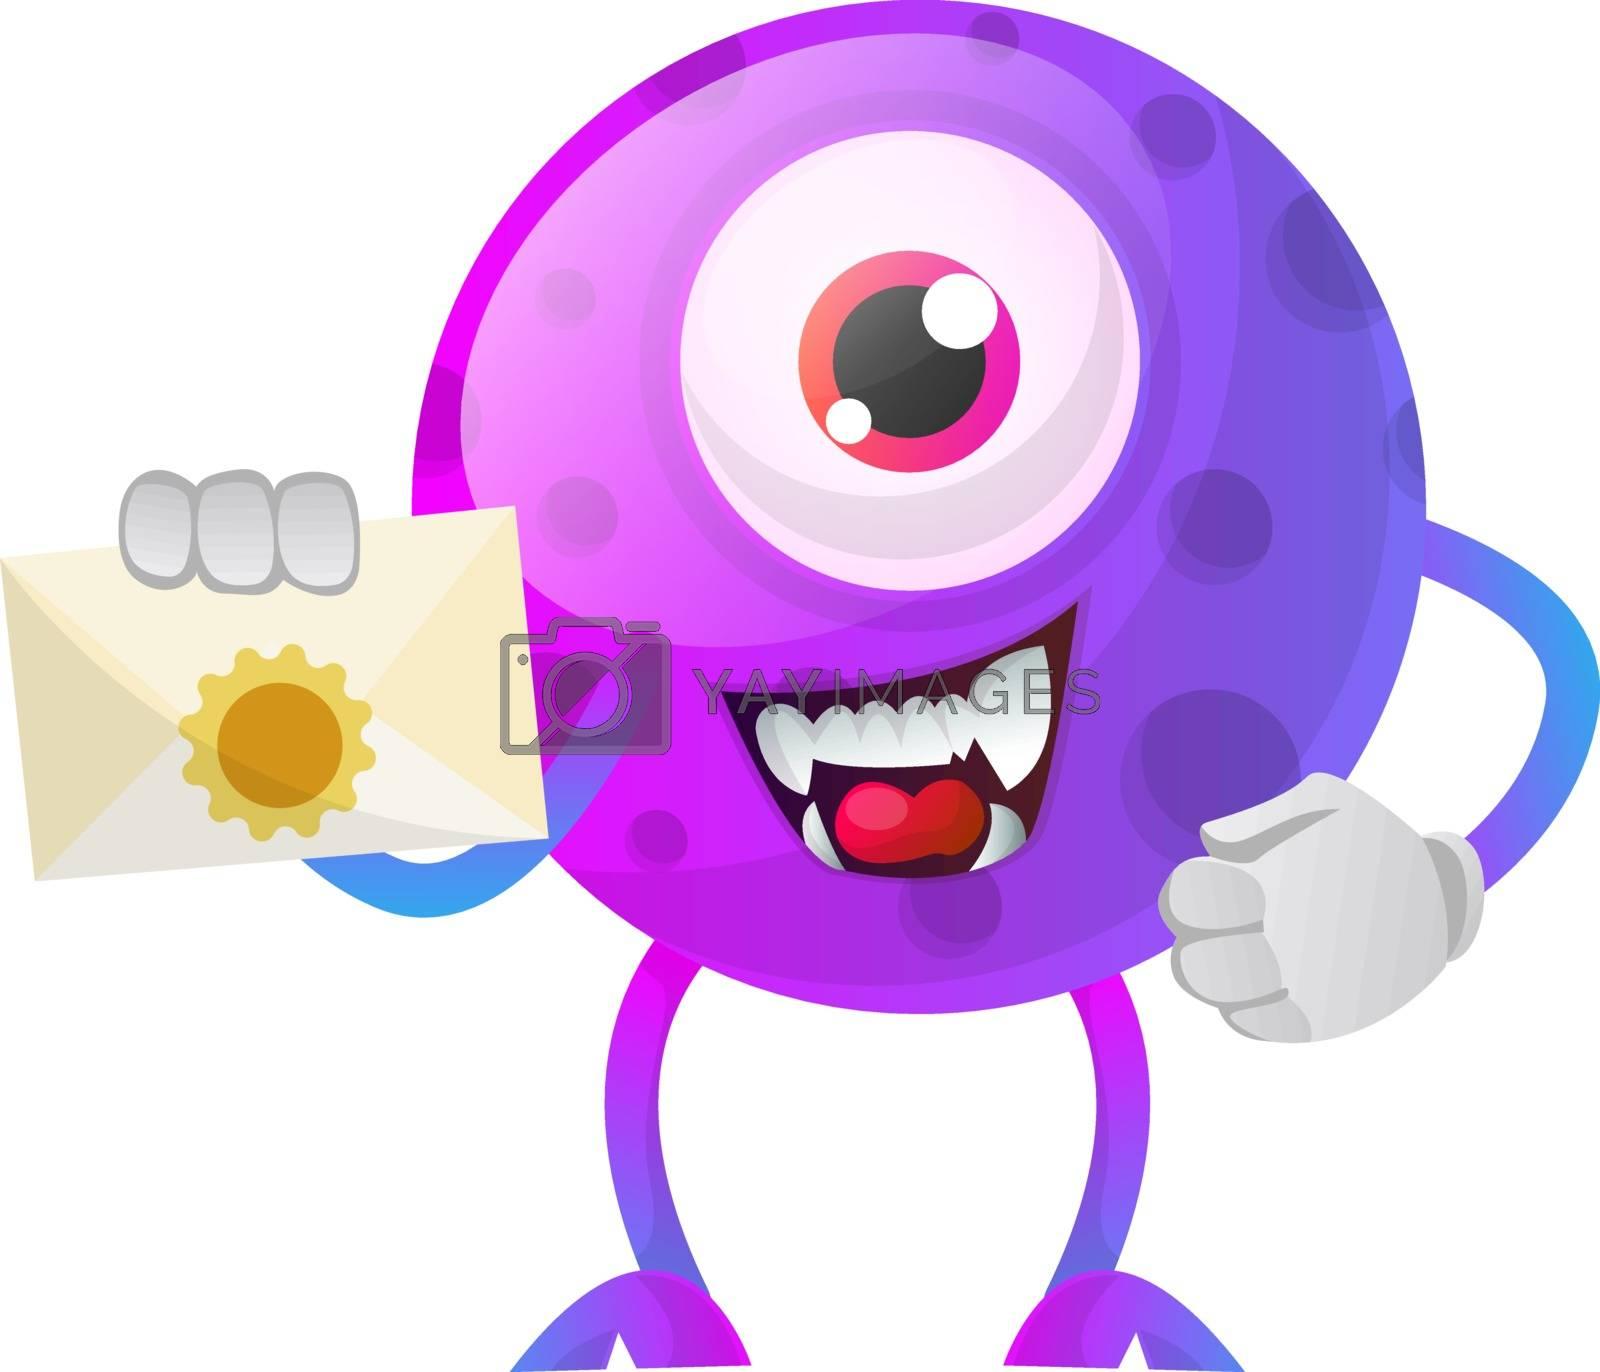 Royalty free image of Purple monster holding envelope illustration vector on white bac by Morphart